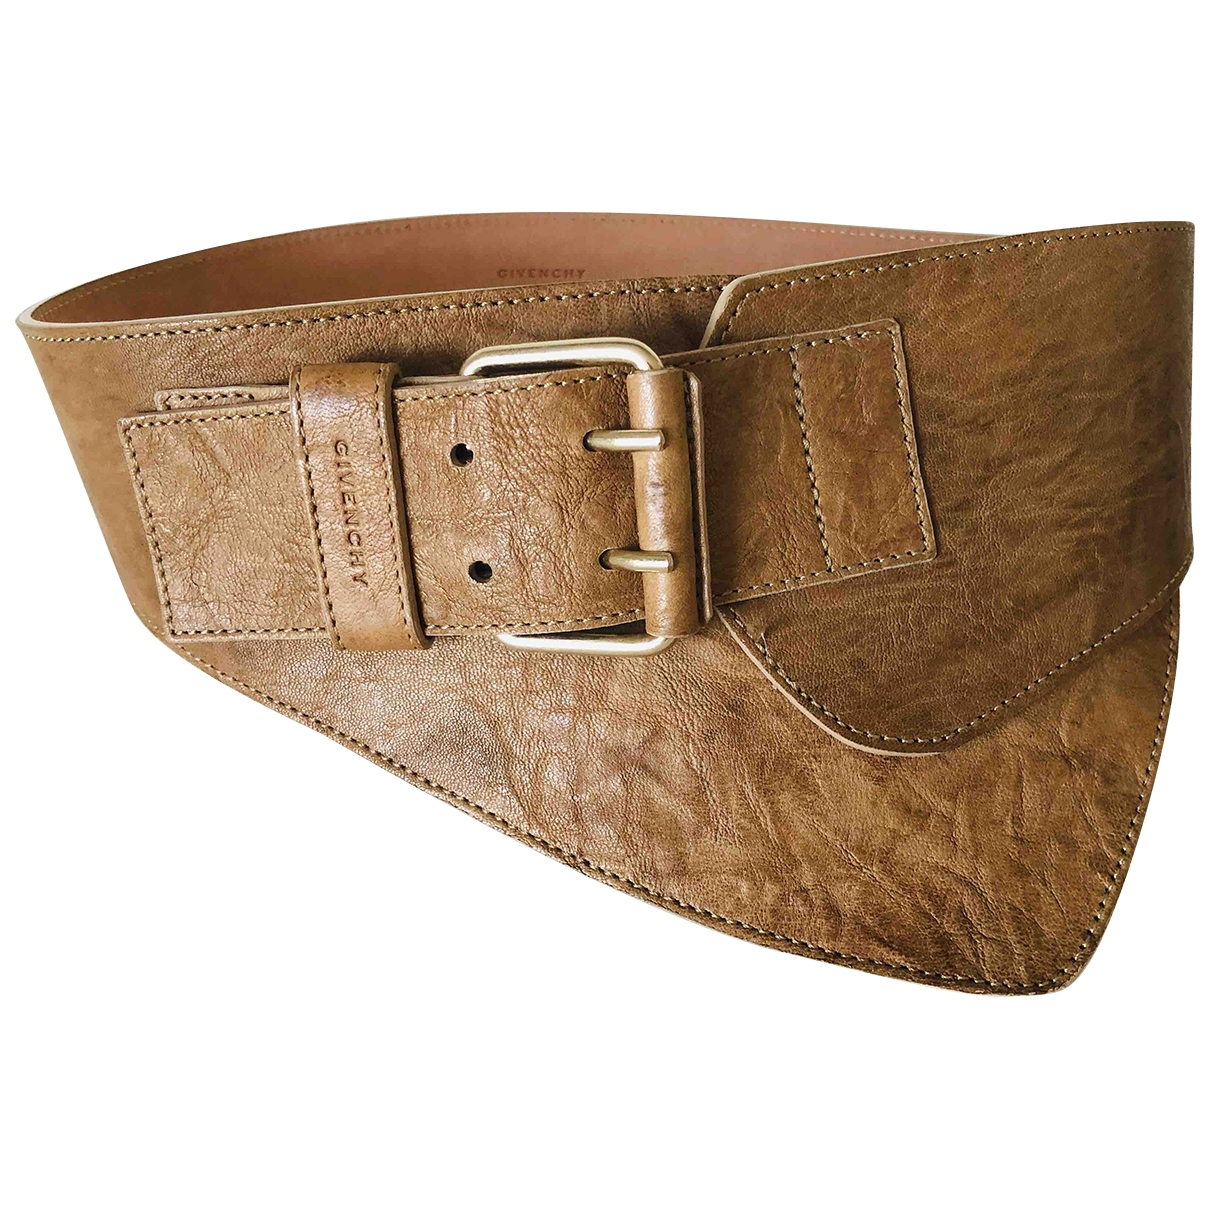 Cinturon de Cuero Givenchy